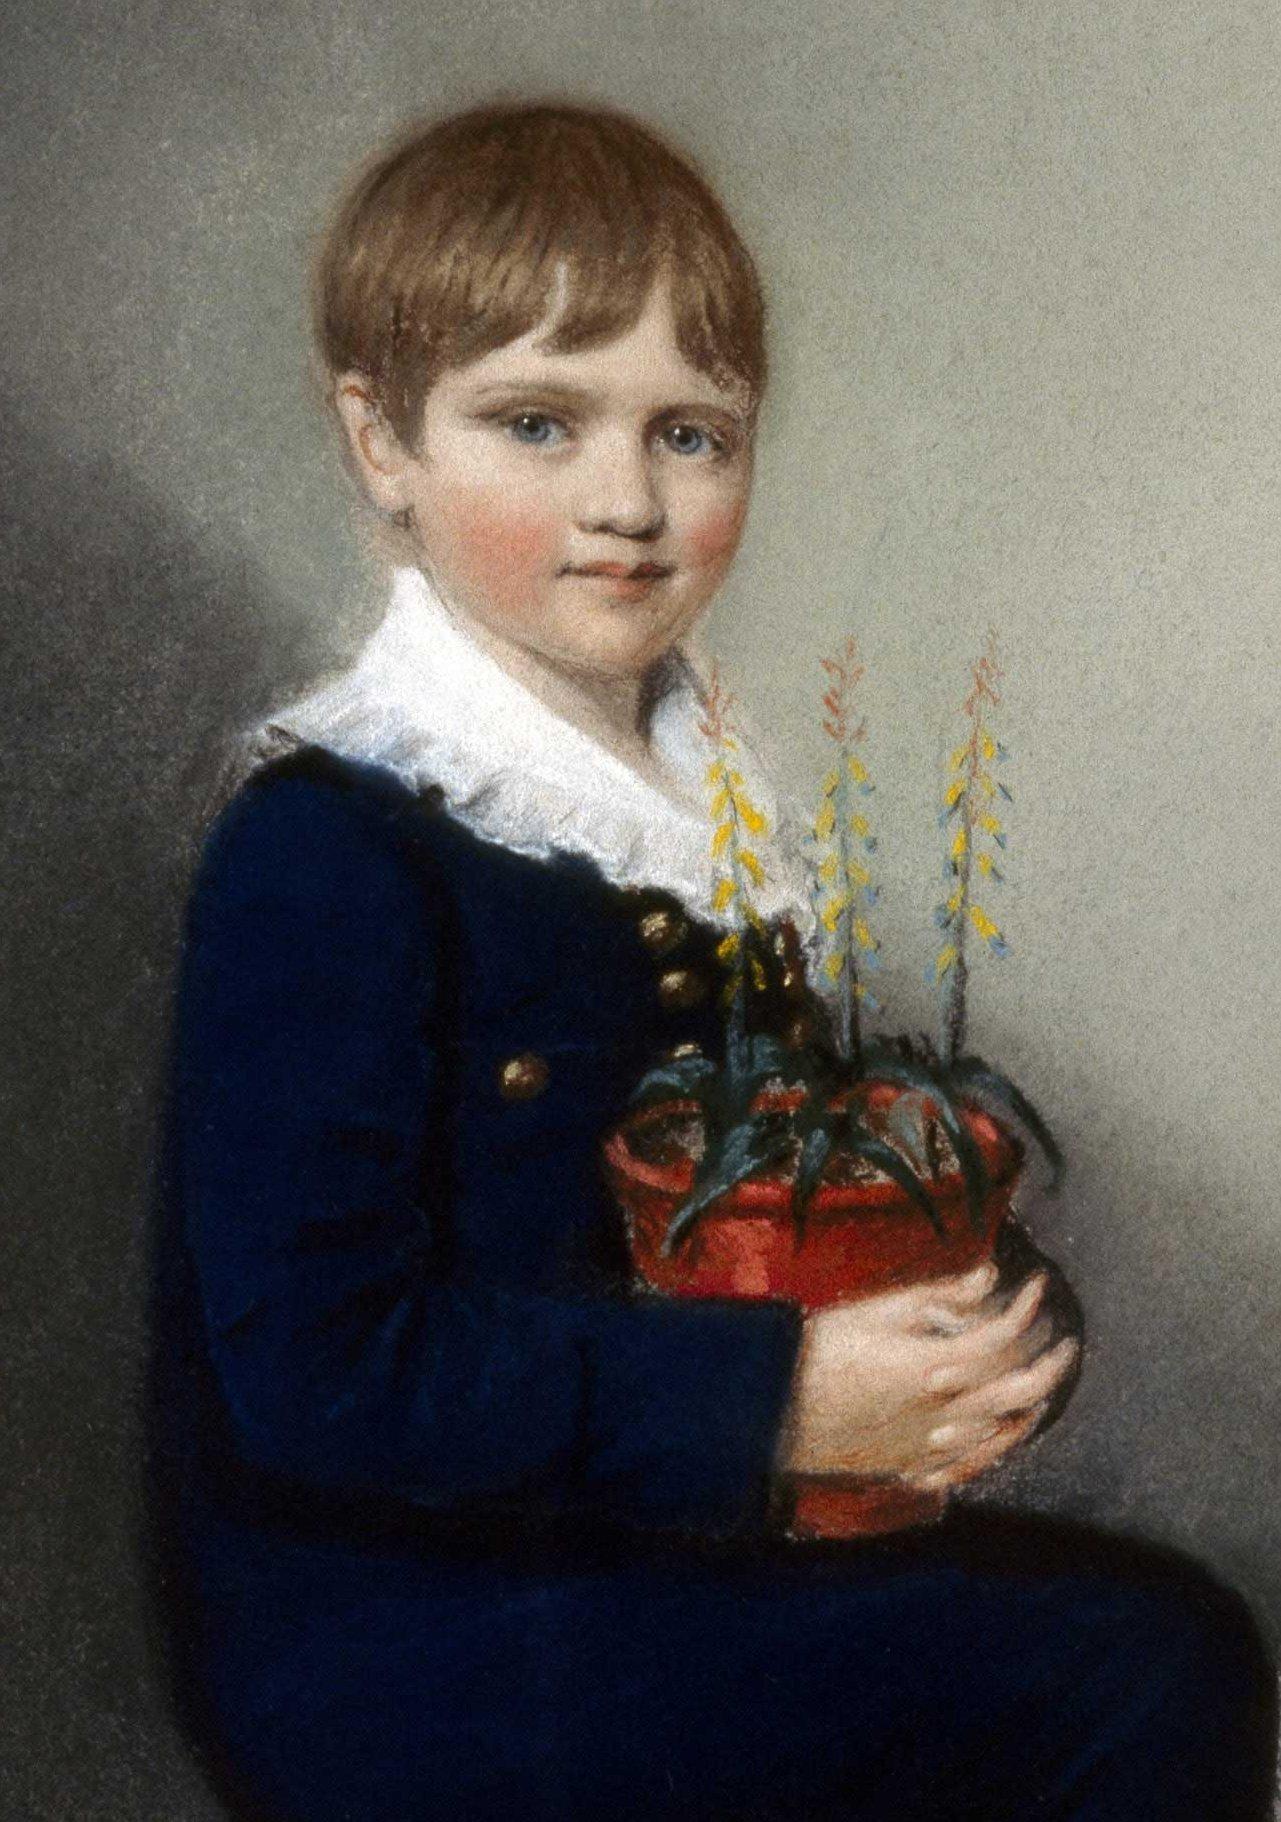 Young Charles Darwin 1816